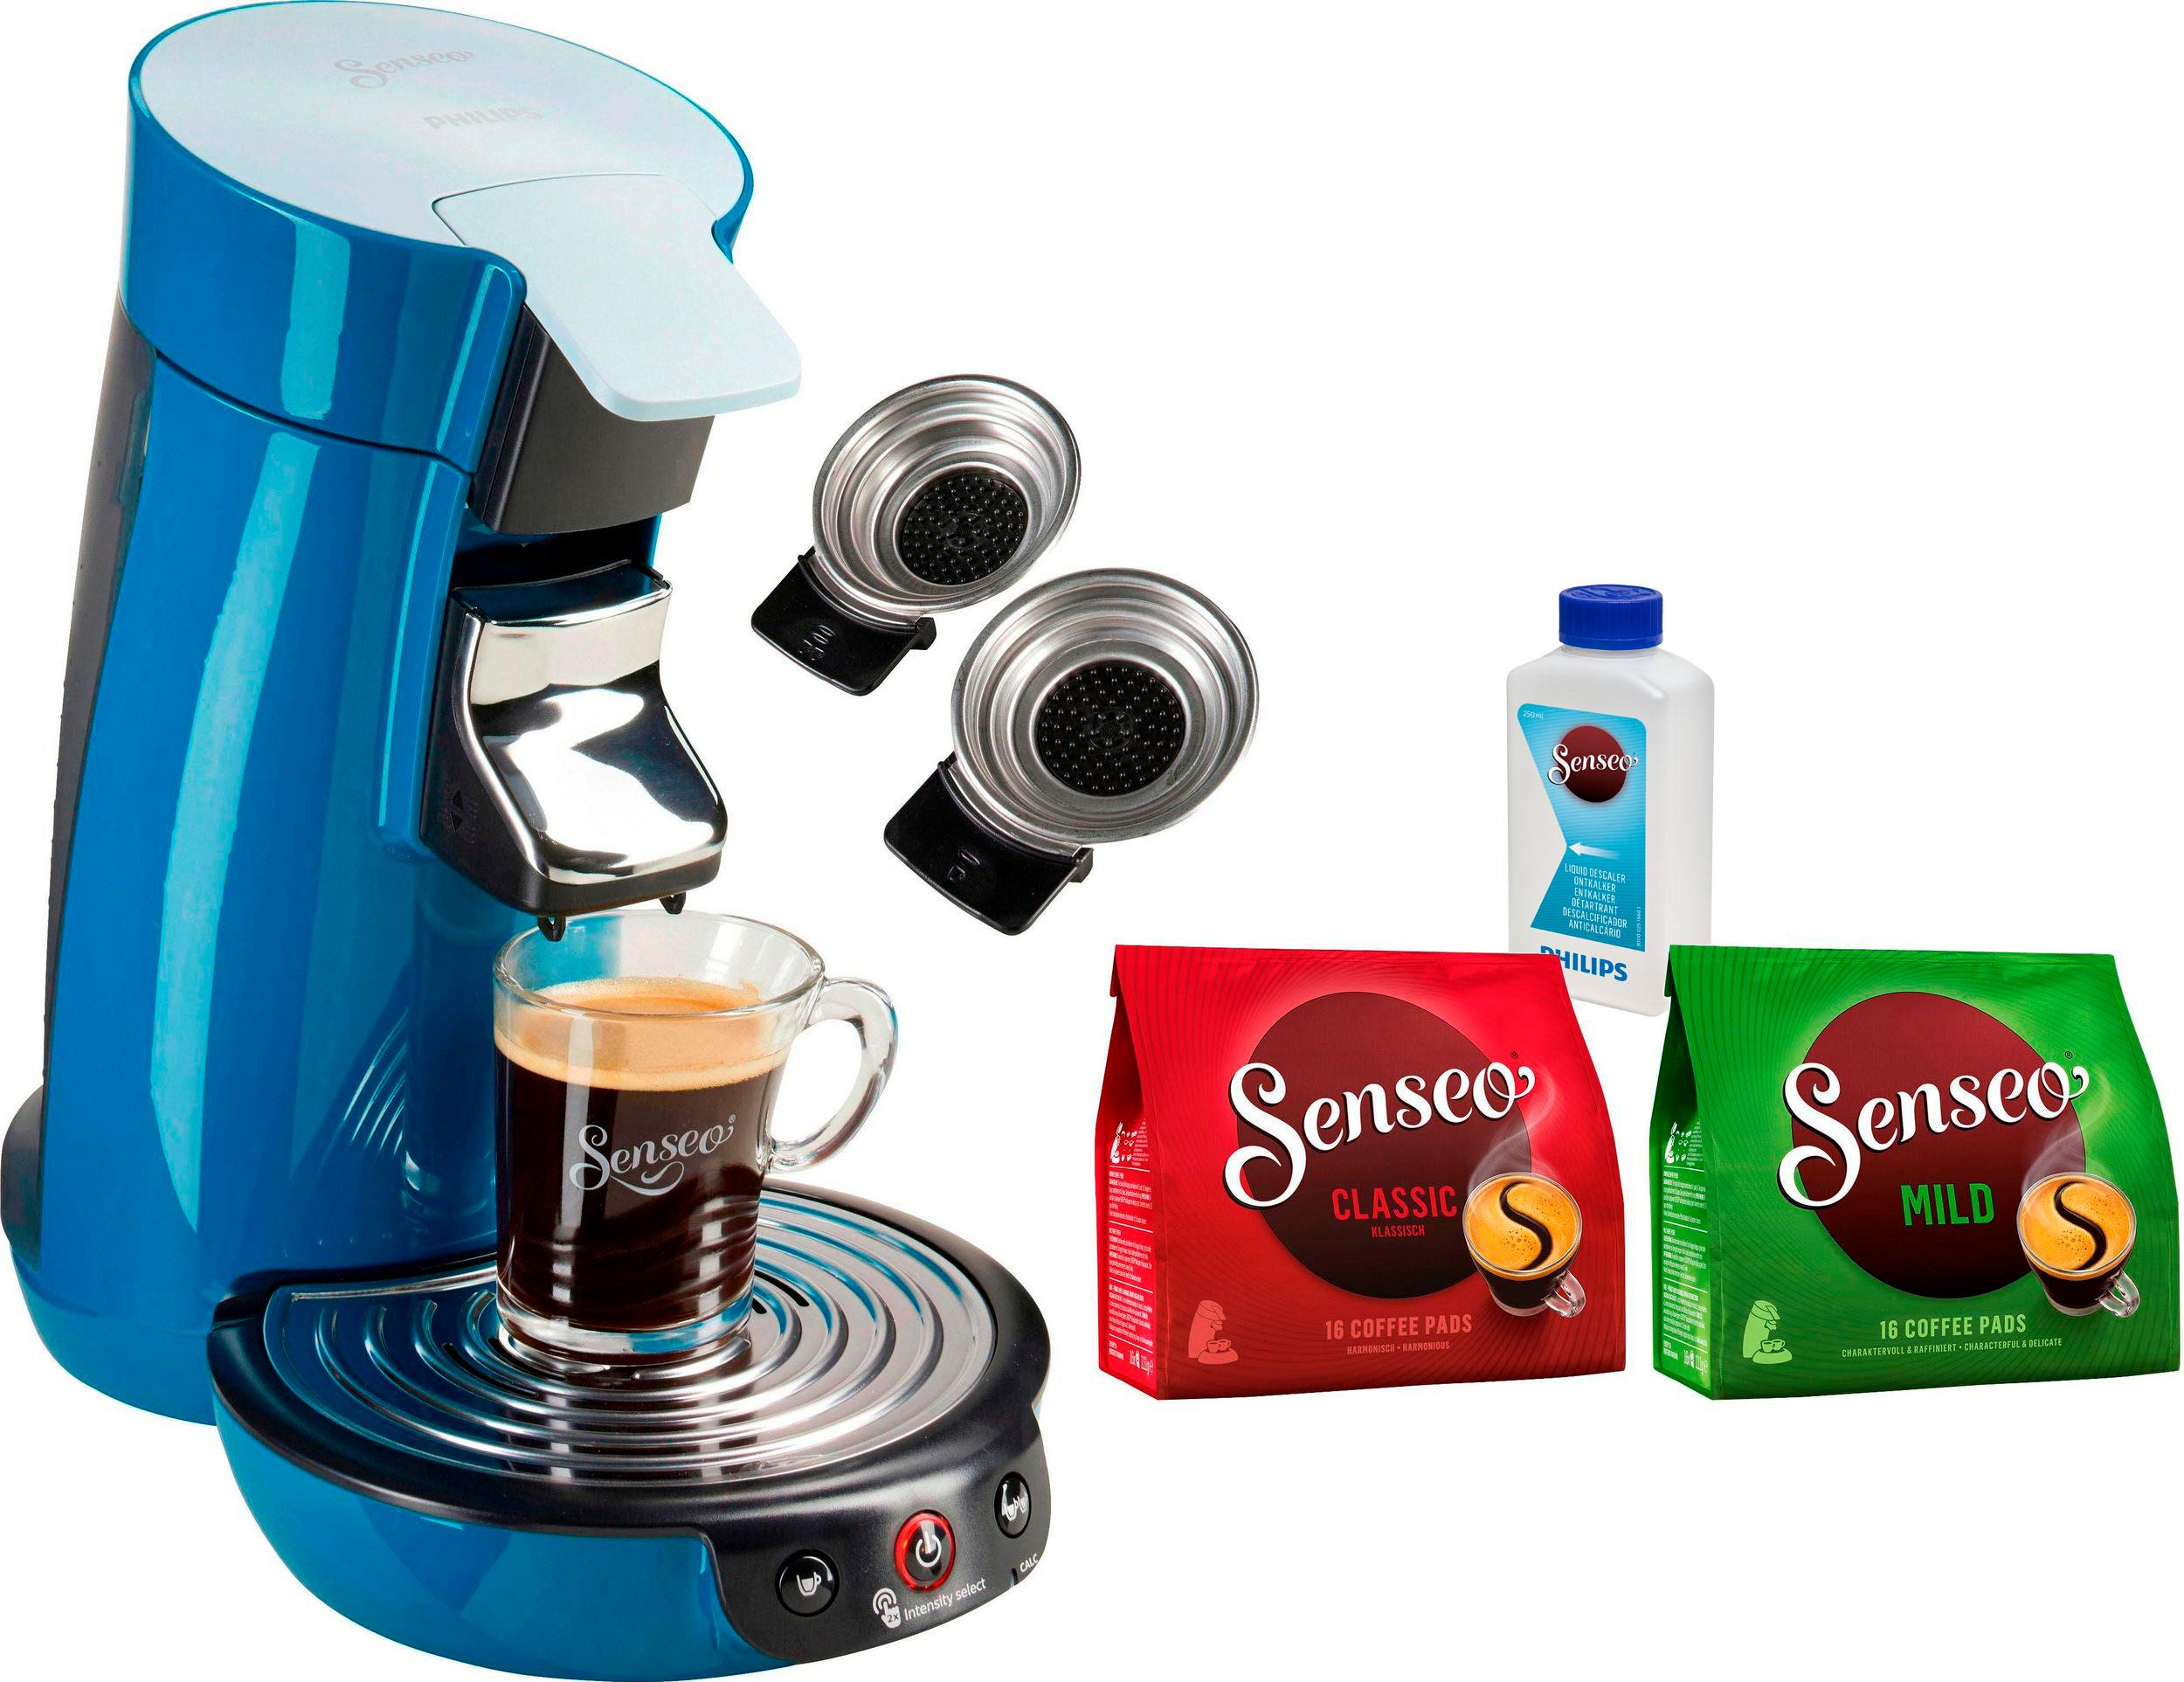 senseo kaffeepadmaschine senseo viva caf hd6563 70 auf. Black Bedroom Furniture Sets. Home Design Ideas